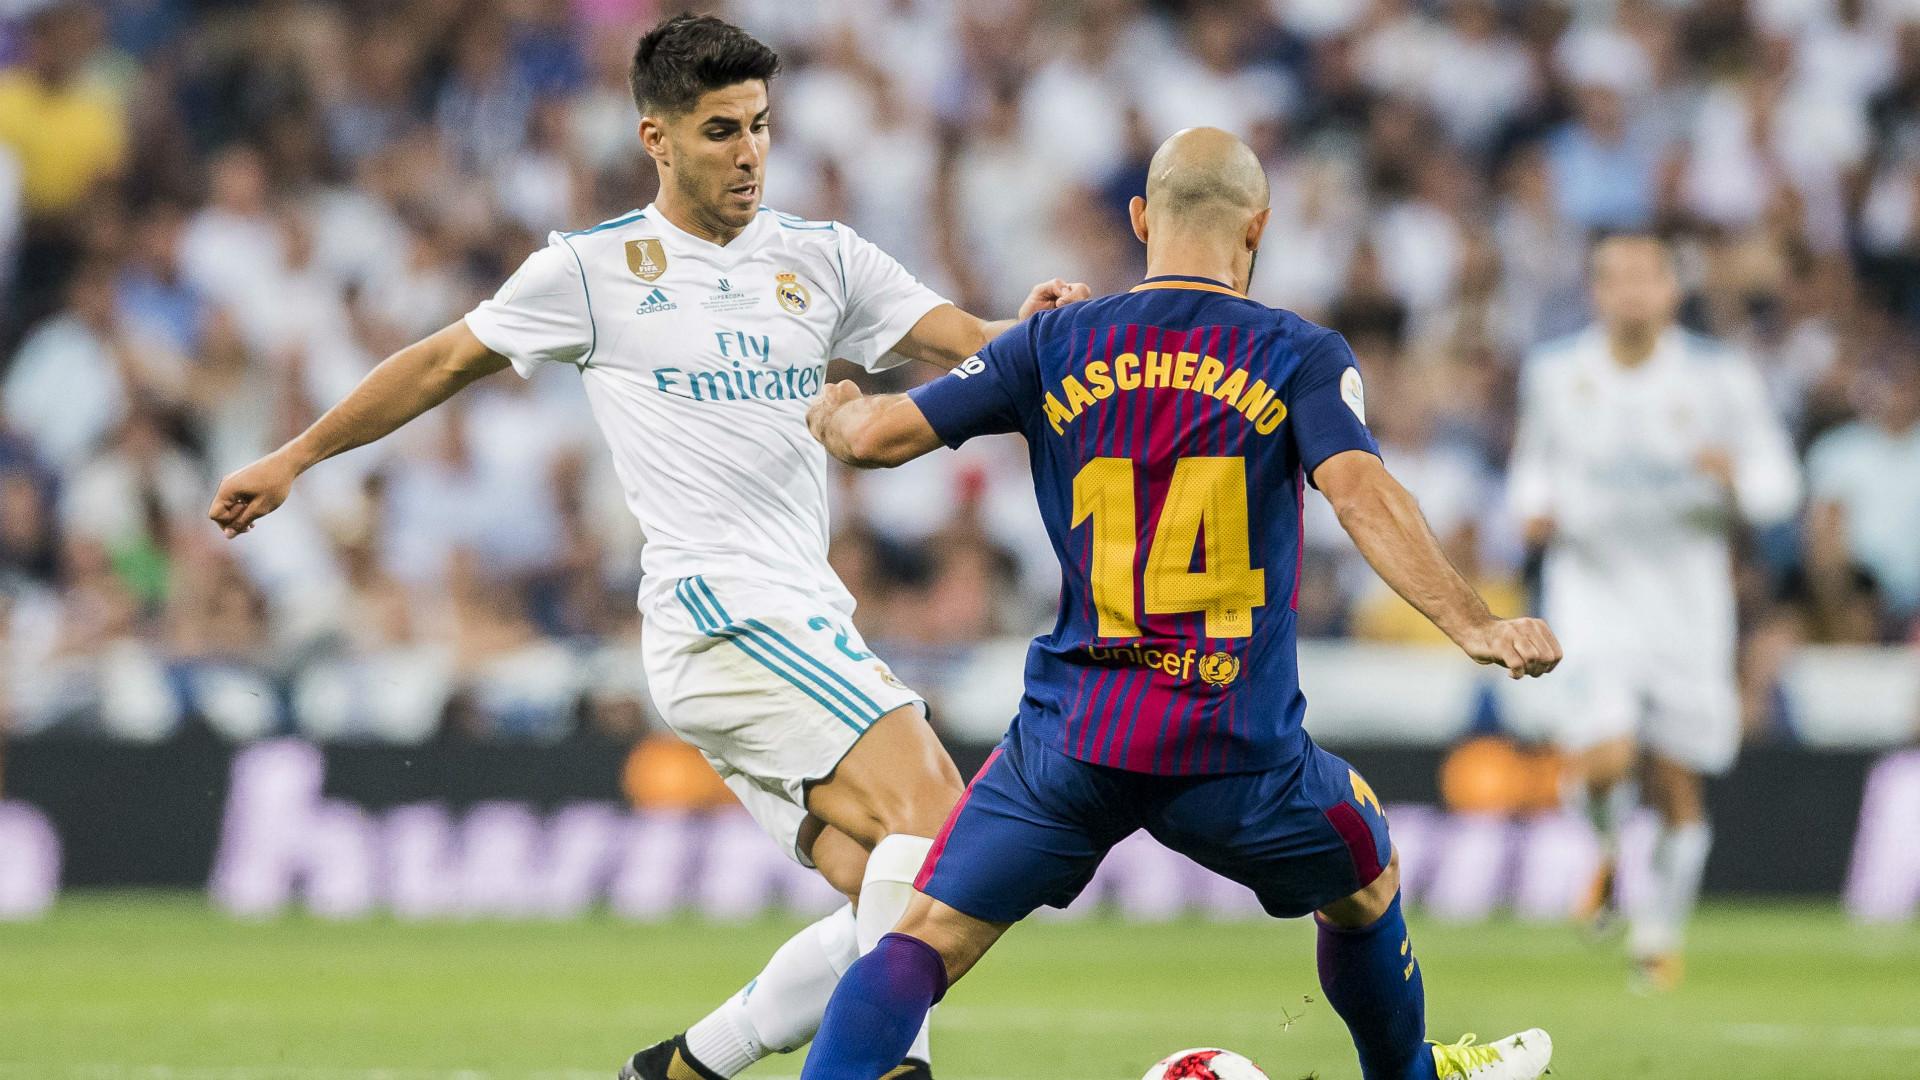 Mascherano Real Madrid Barcelona